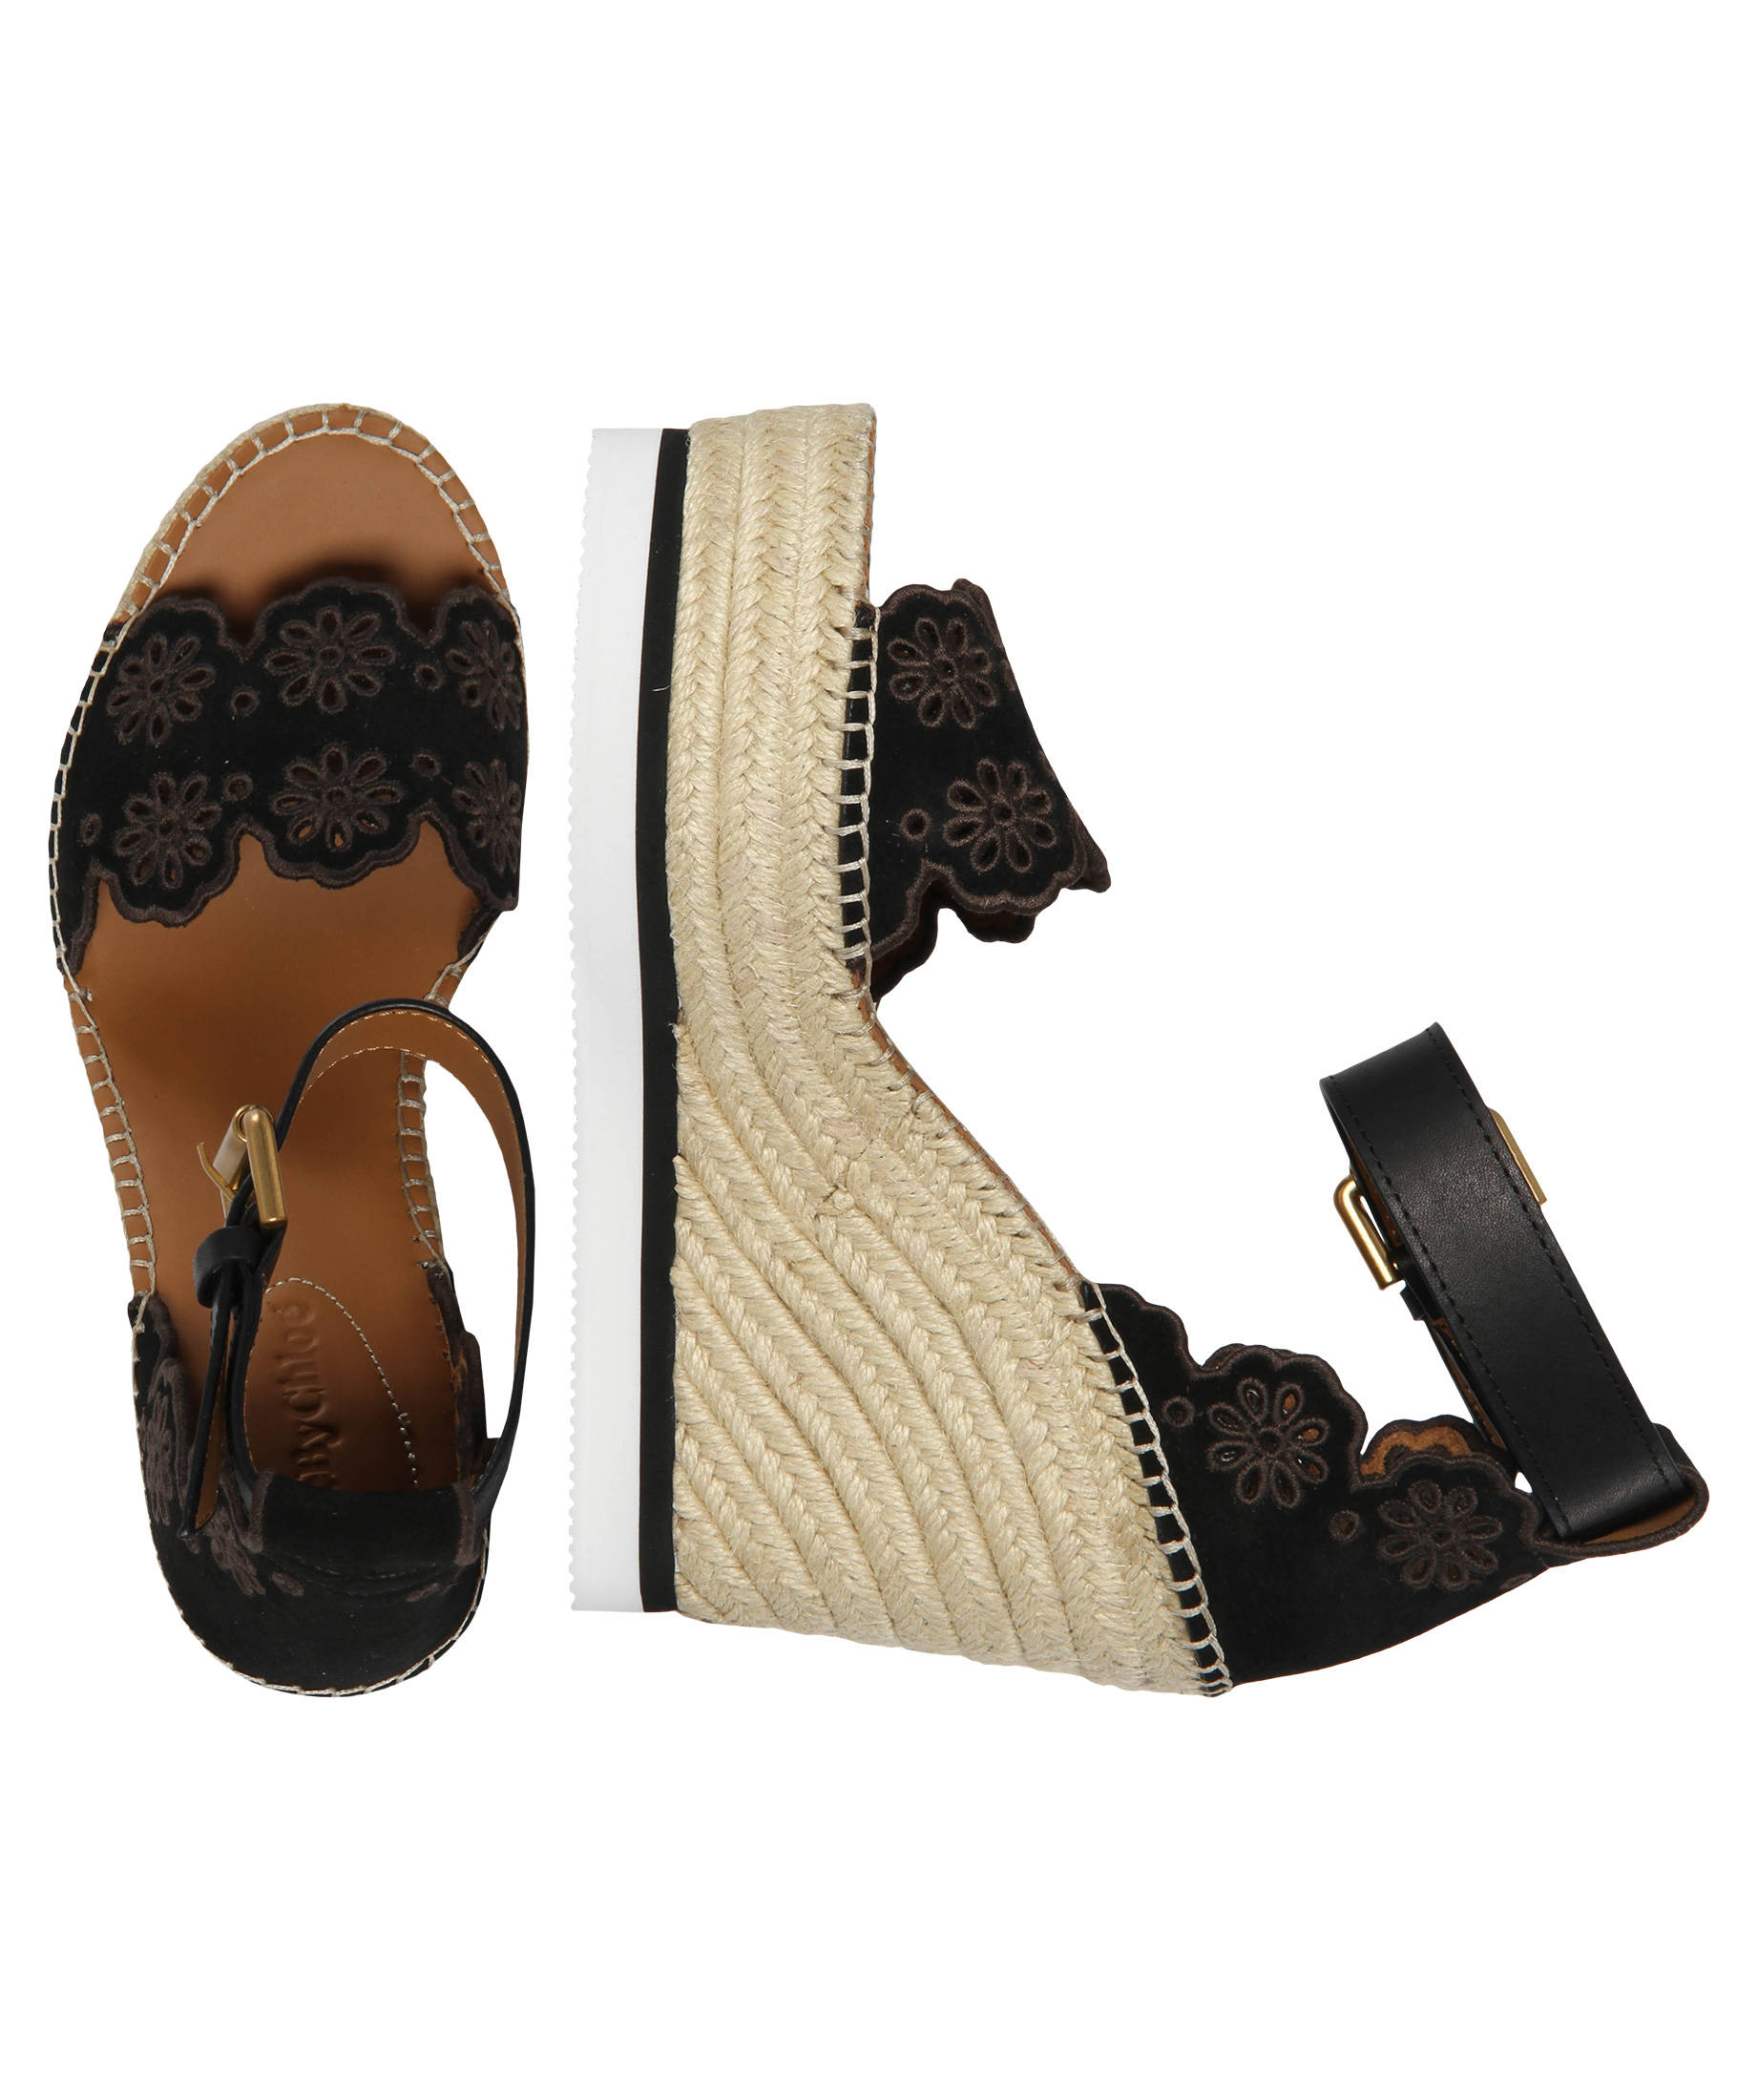 premium selection c3387 ba0b2 Damen Sandaletten